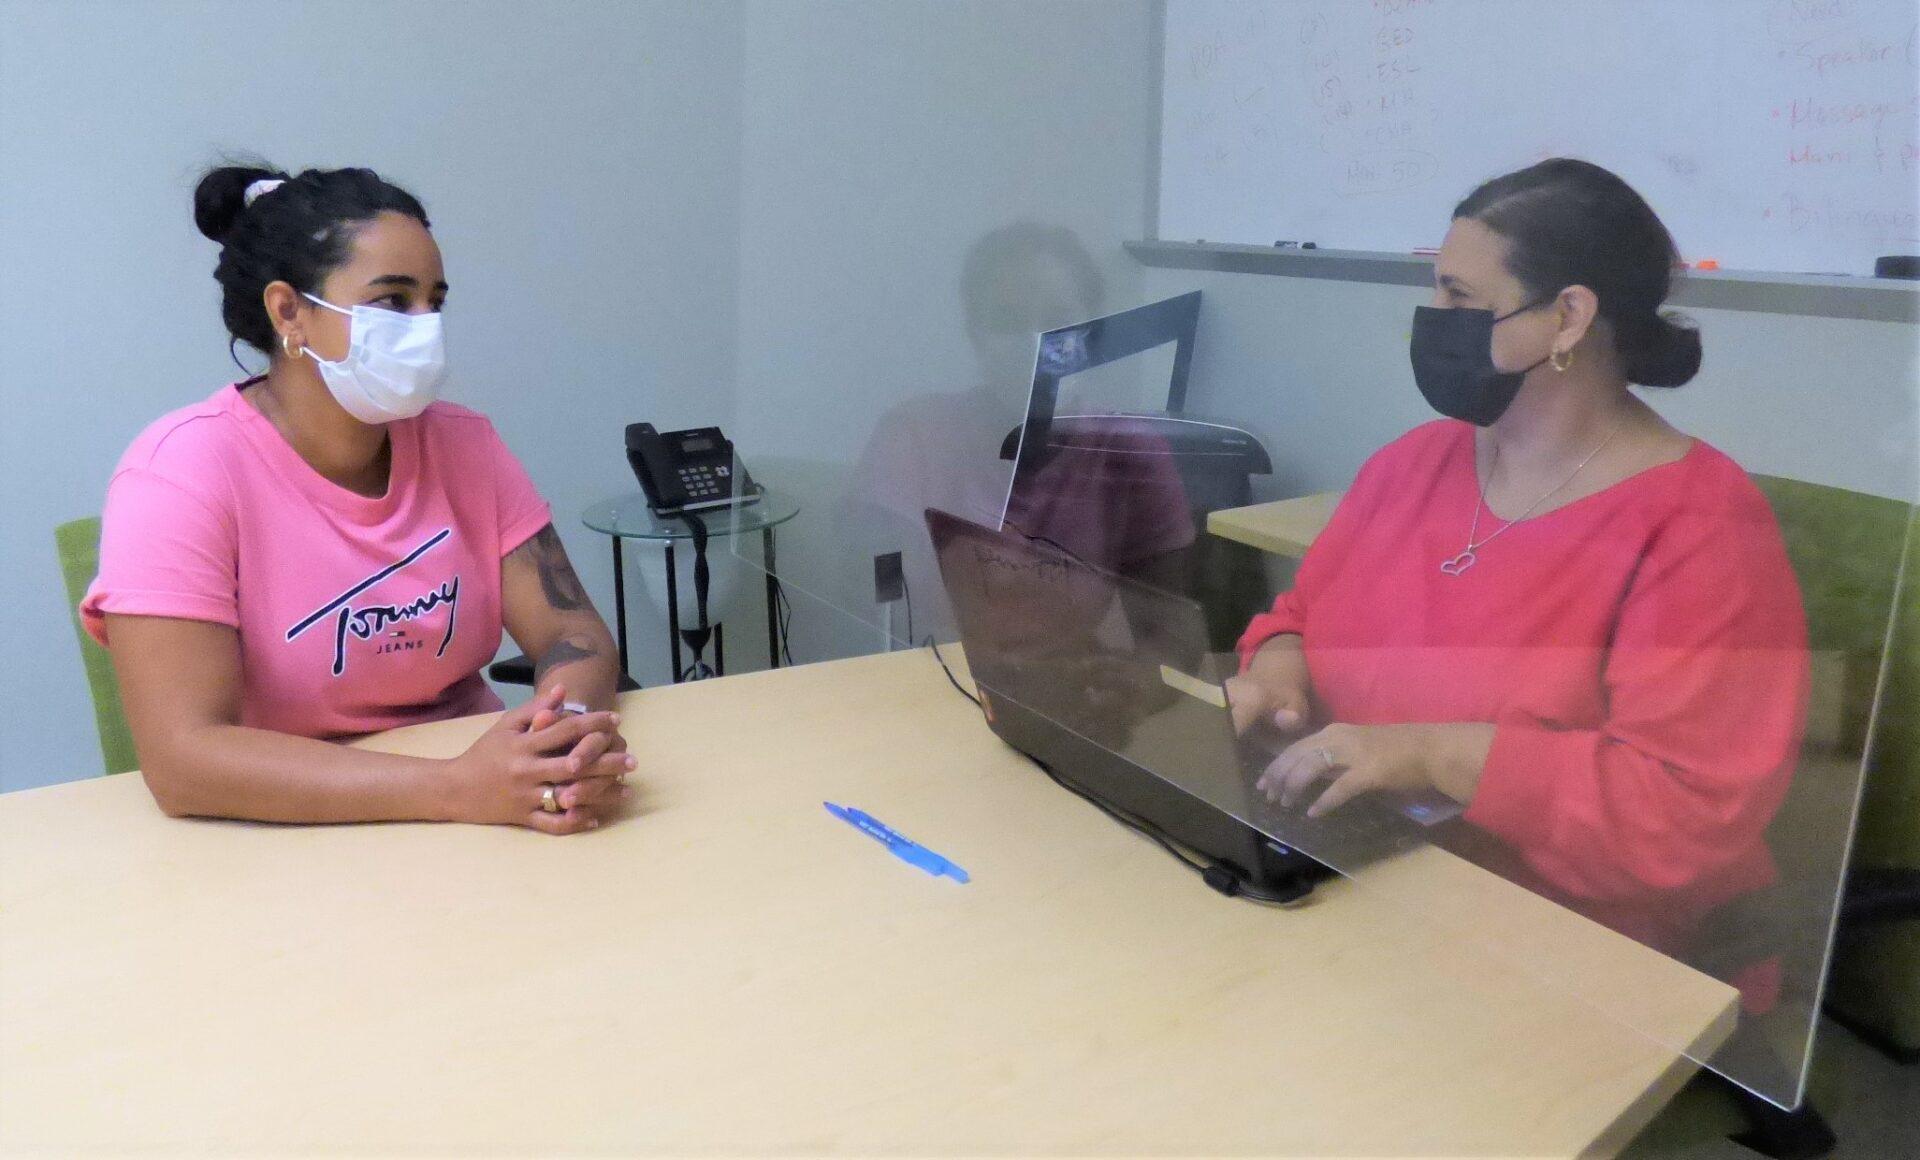 Client Luz Medina, left, talks with career navigator Marisol Sanchez at Tec Centro in Lancaster on Thursday, July 8, 2021. The plexiglass partition between them is a Covid-19 precaution. (Photo: Tim Stuhldreher)